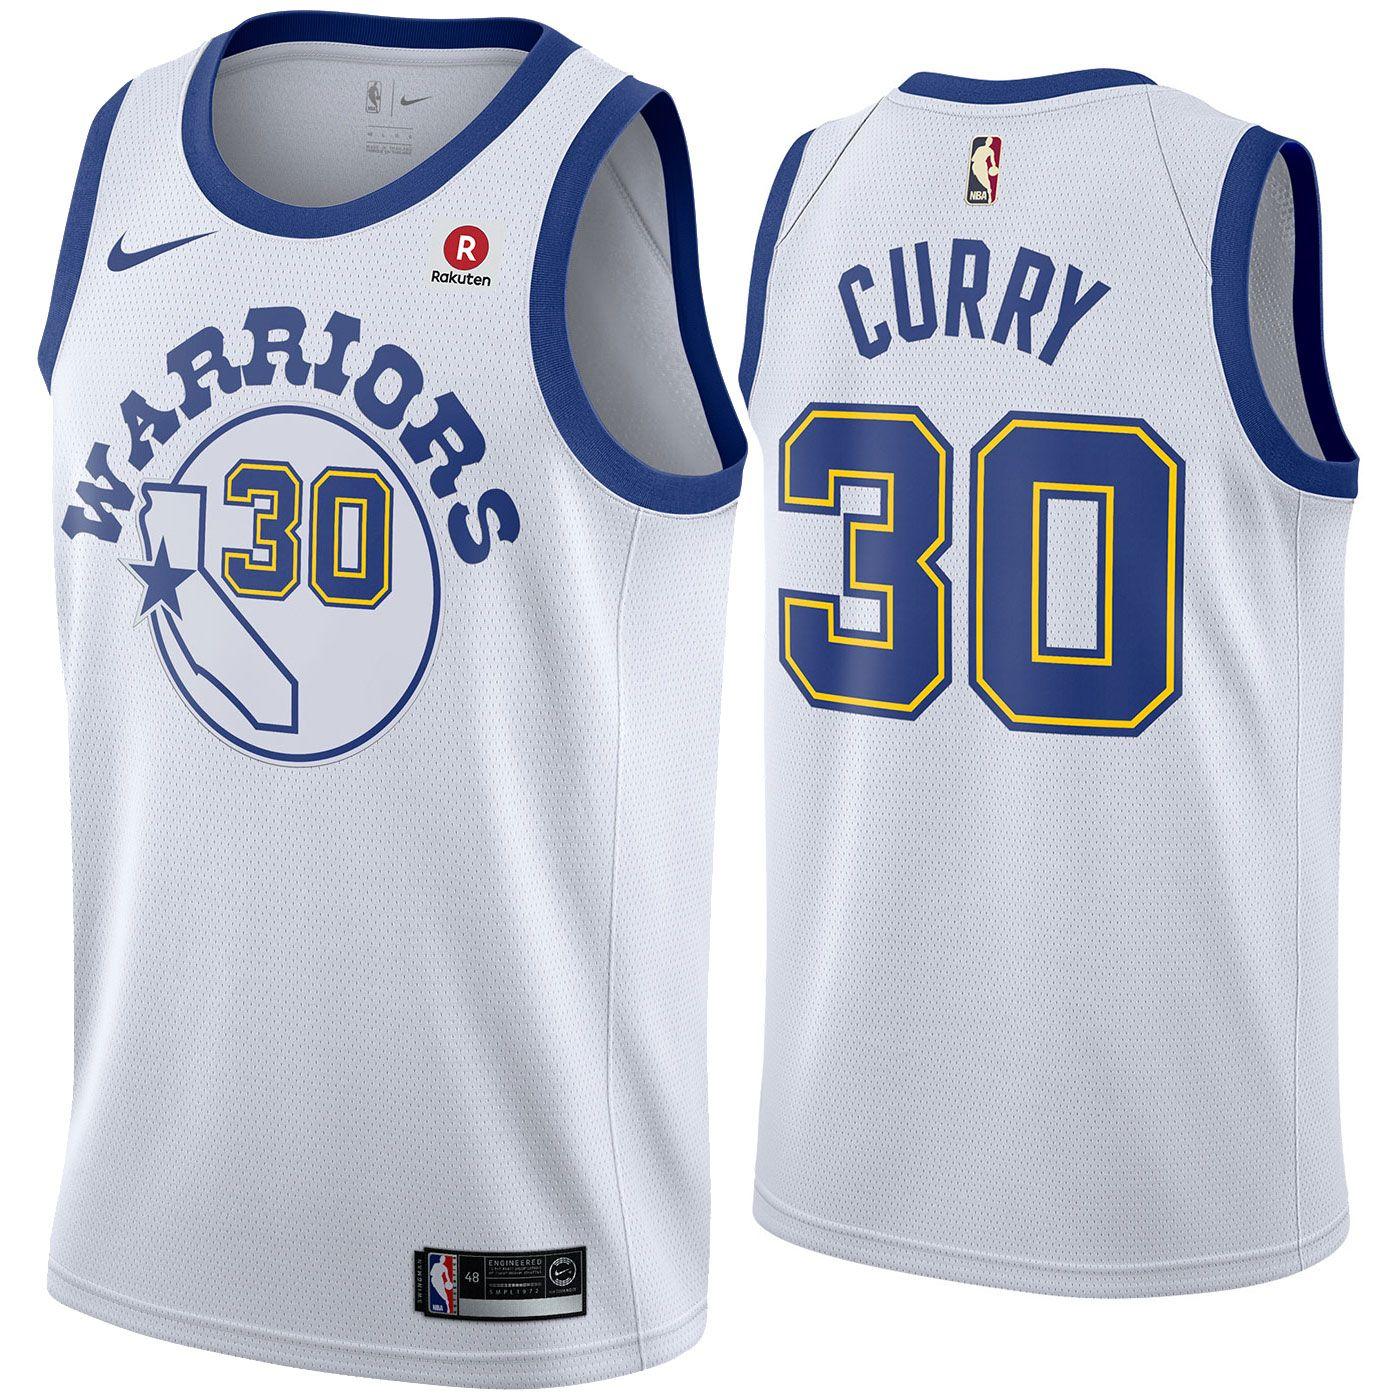 Golden State Warriors Nike Dri-FIT Men's Stephen Curry #30 Swingman Hardwood Classic Jersey ...